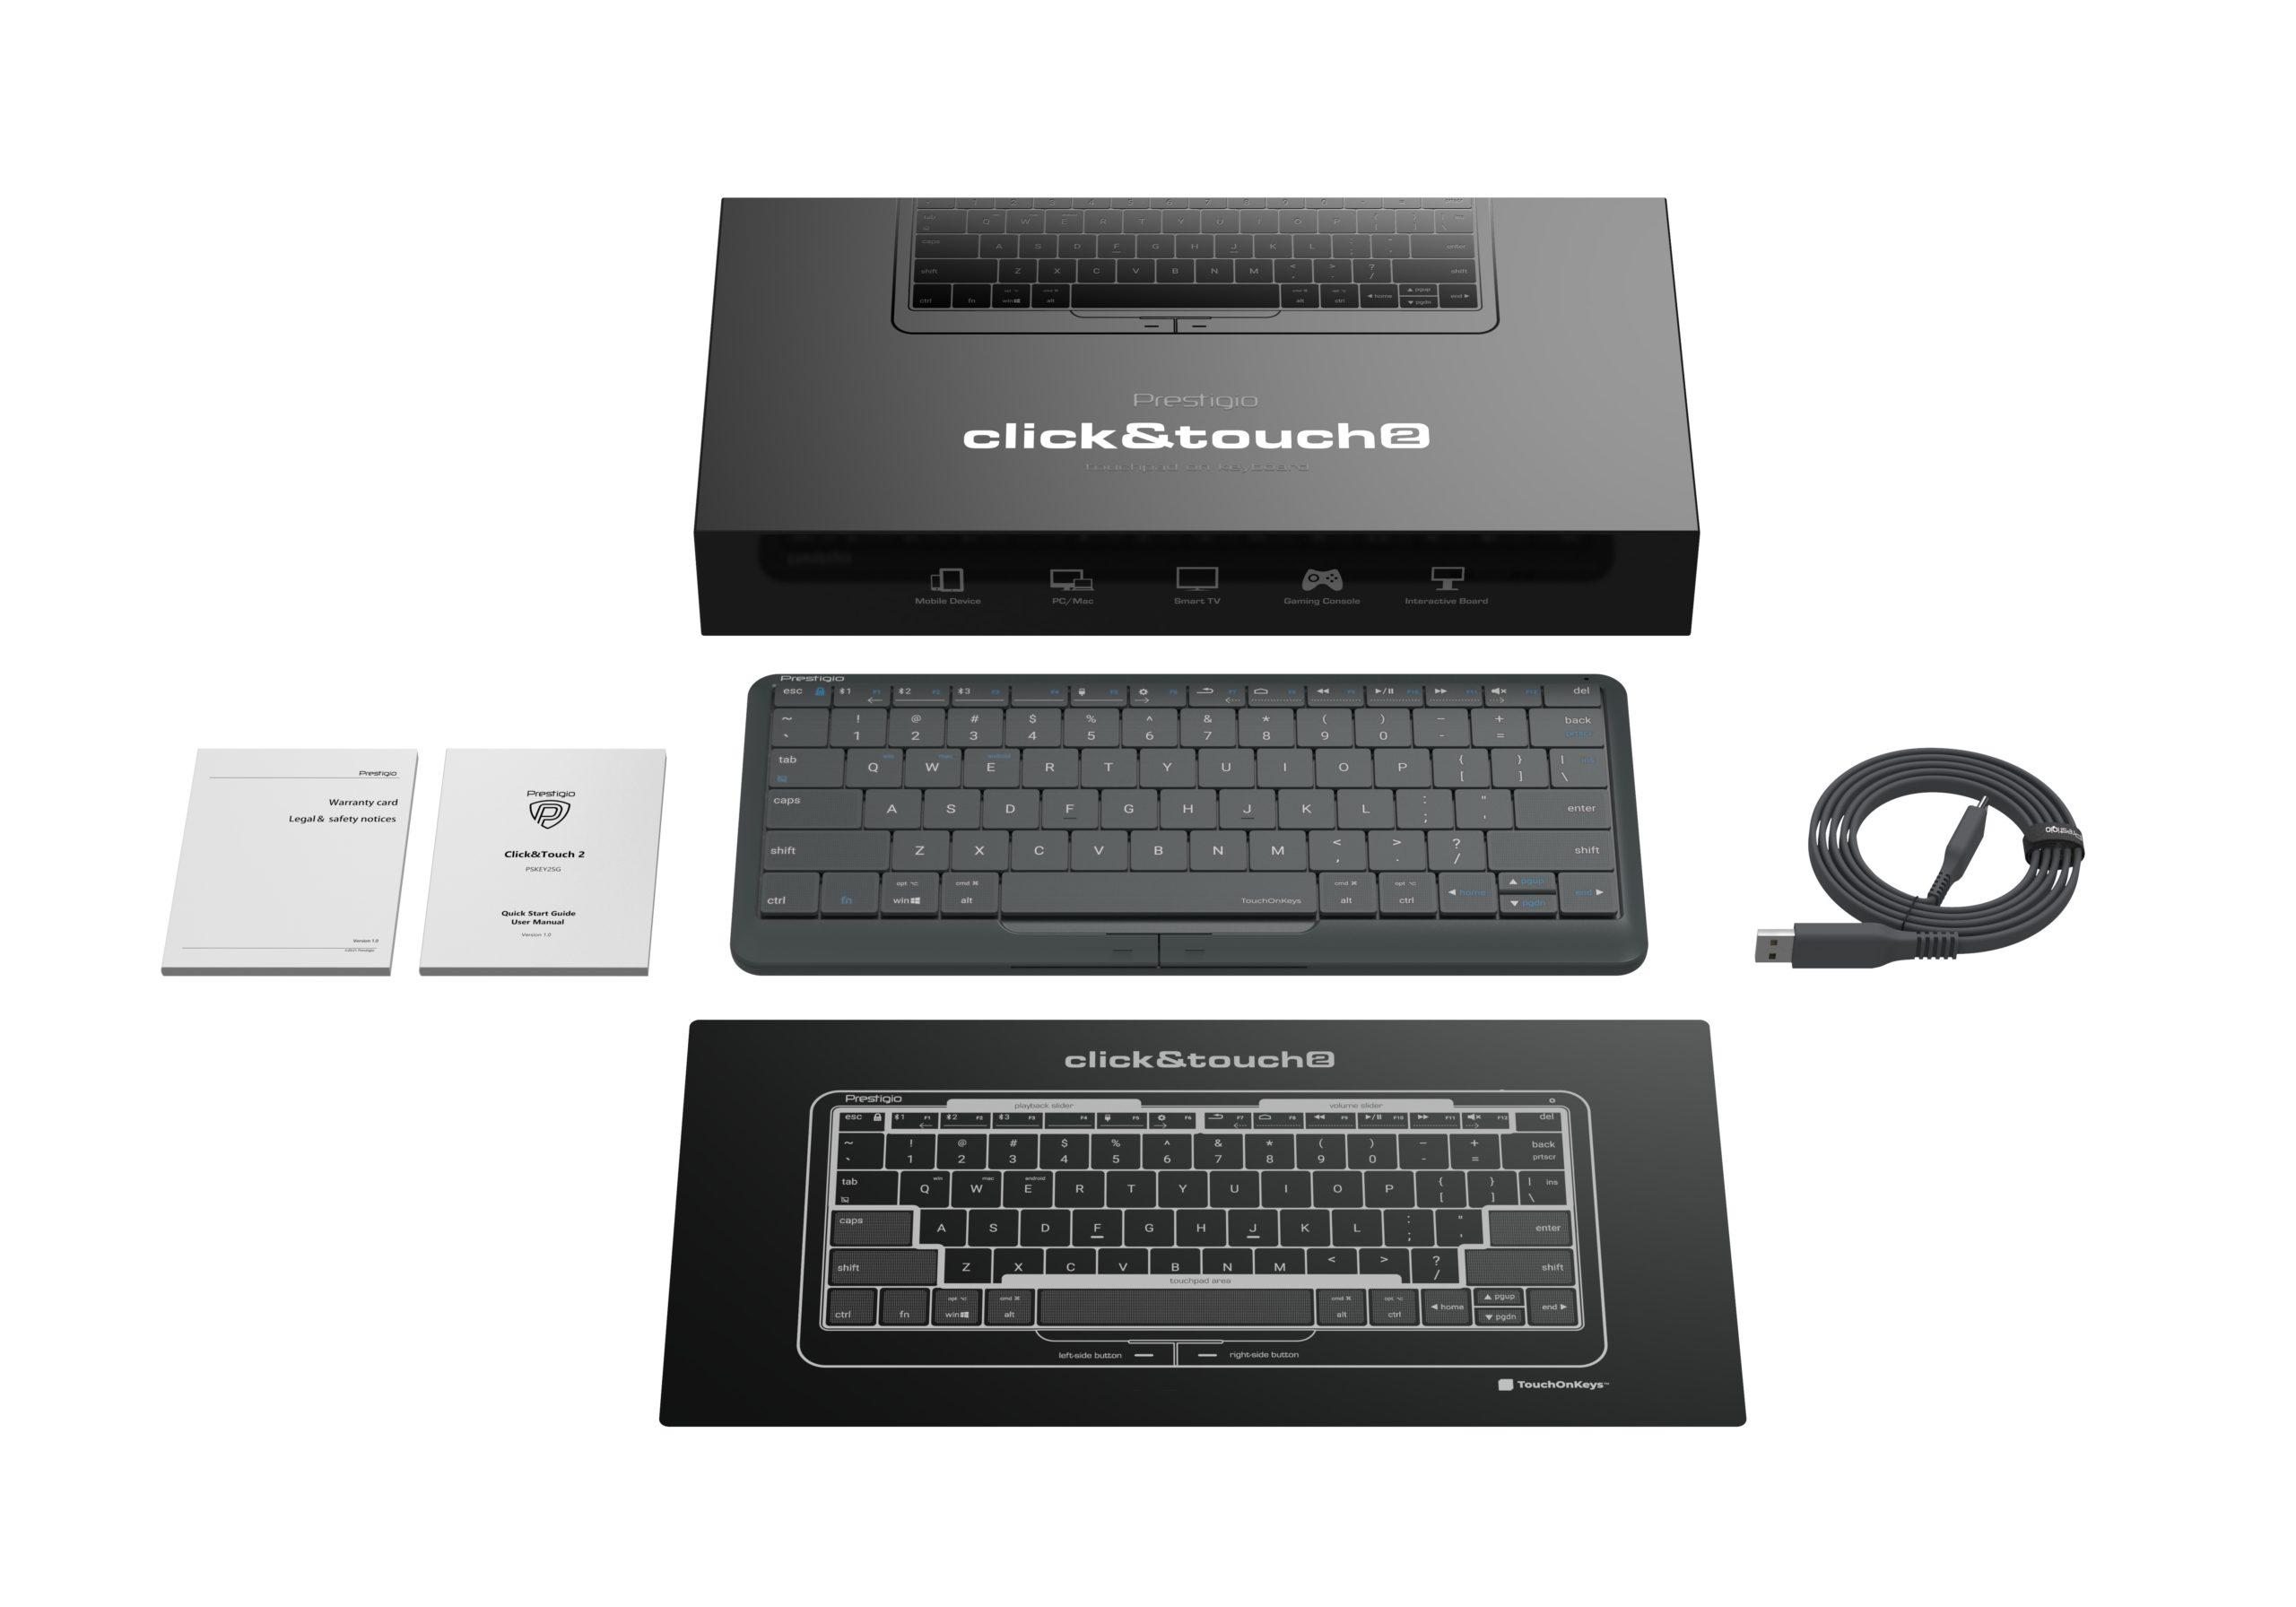 Cмарт-клавиатура и тачпад Click&Touch 2 от Prestigio